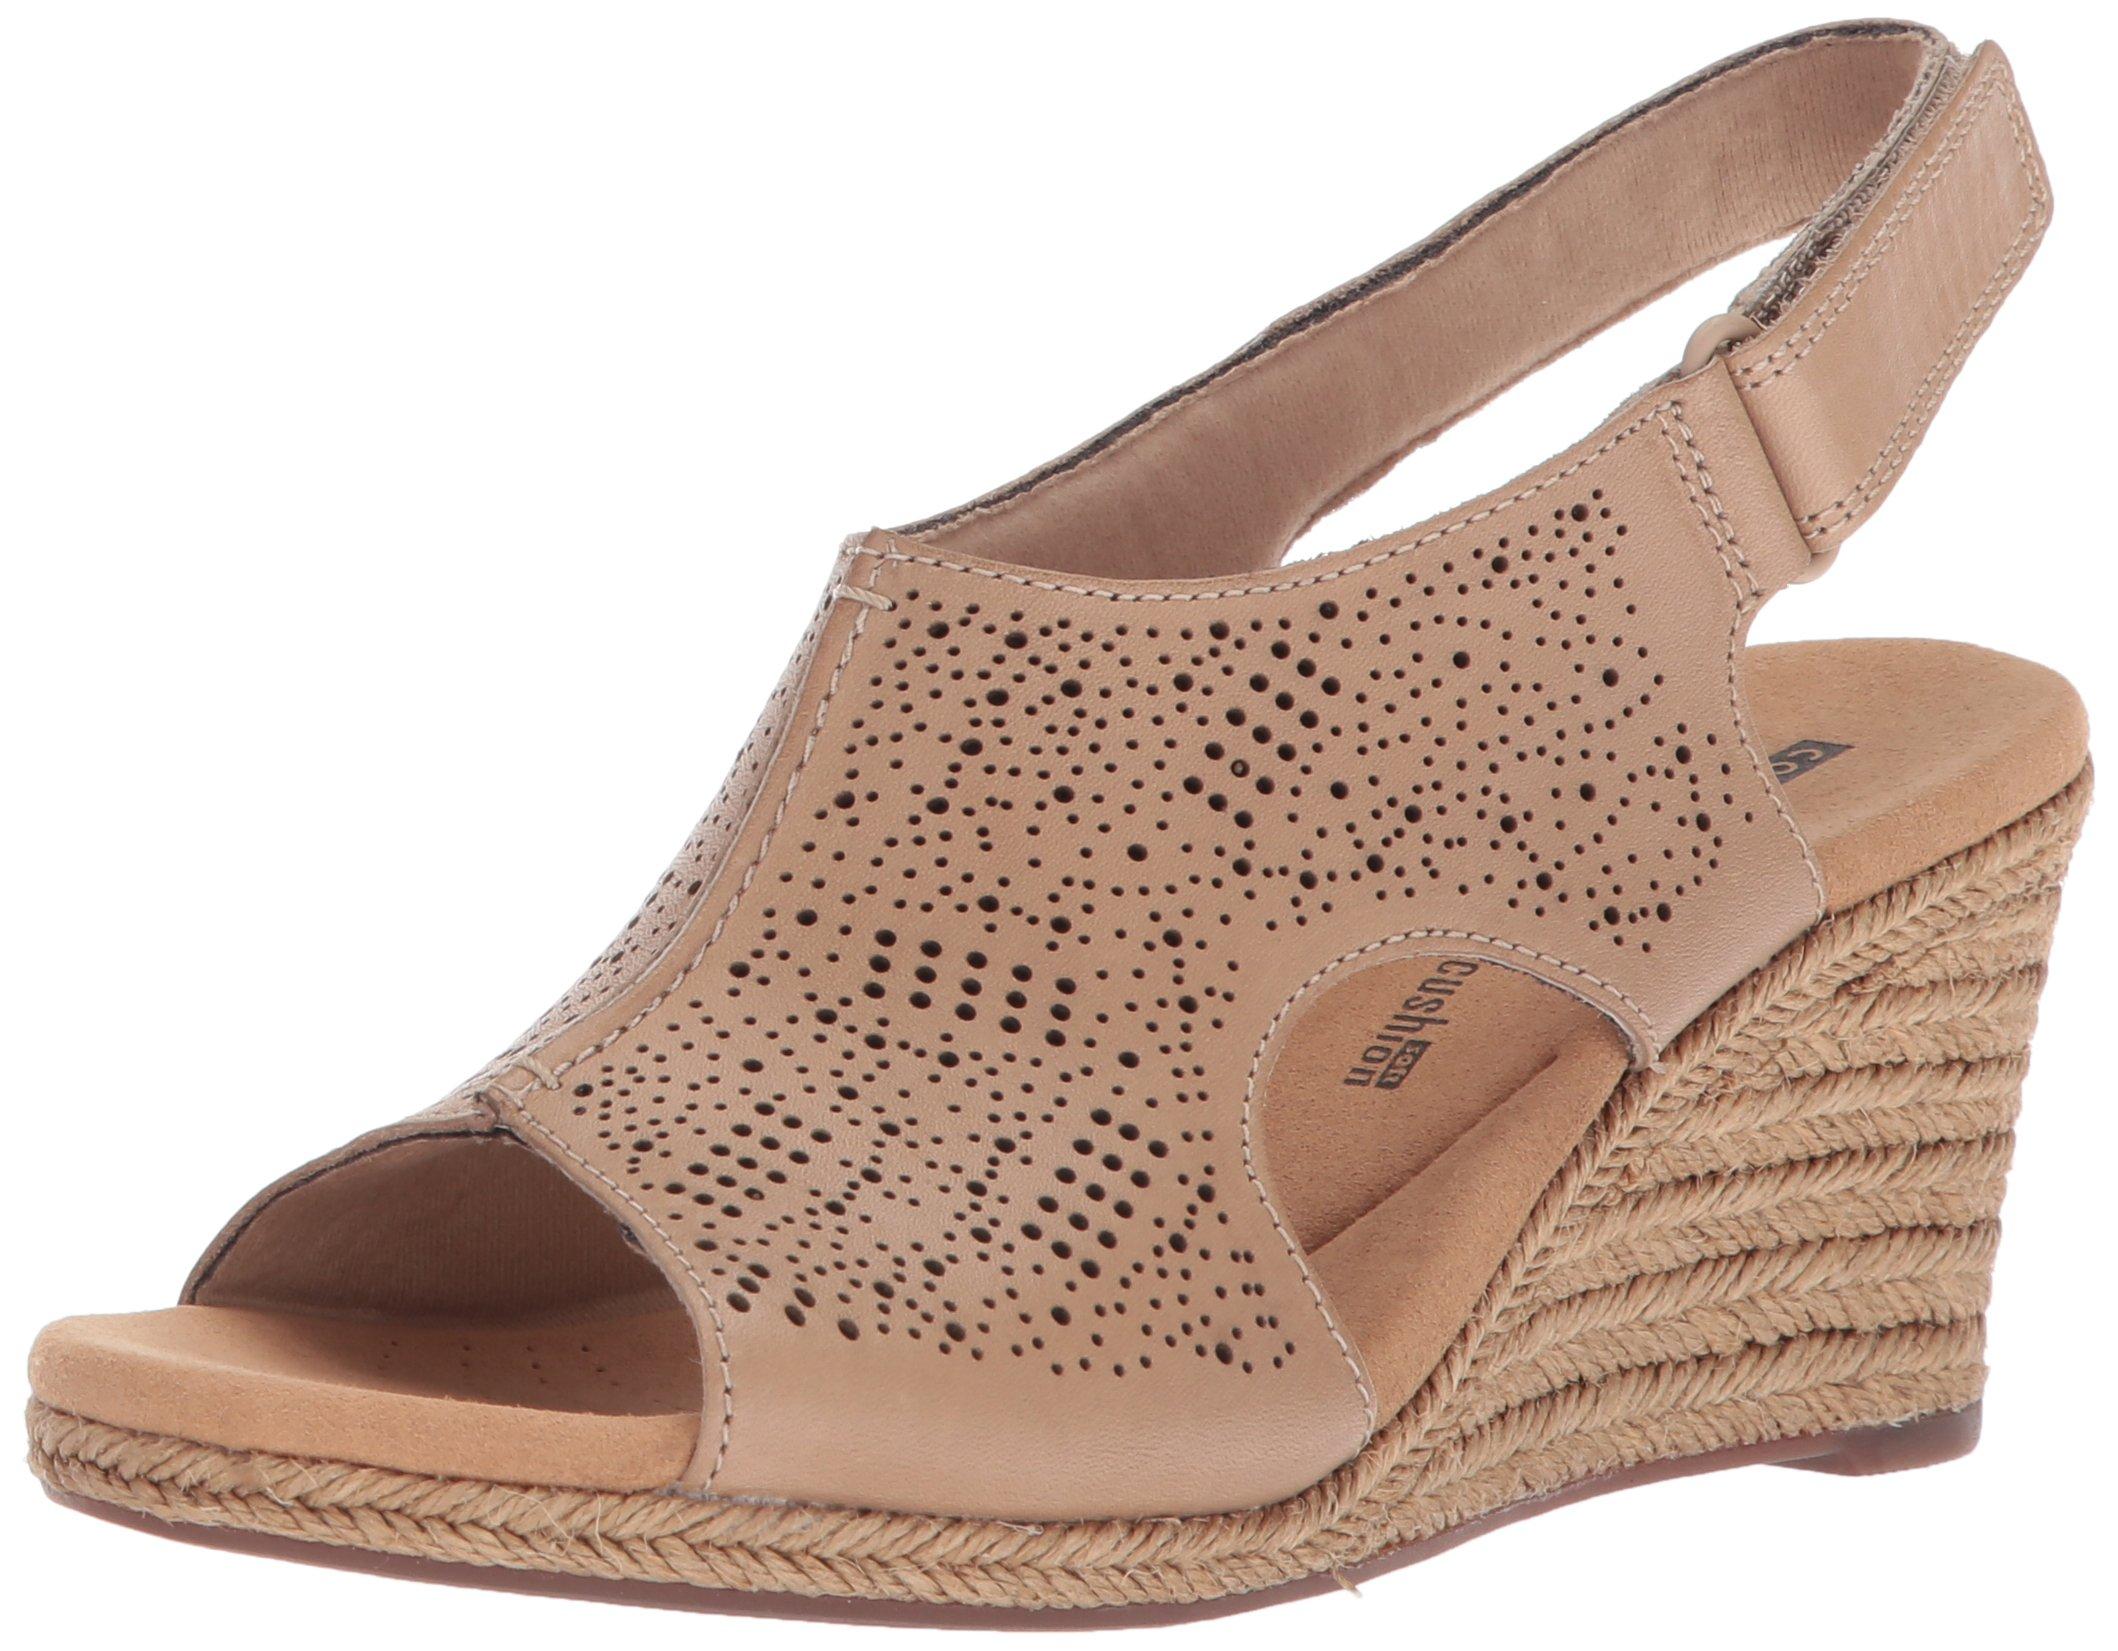 CLARKS Women's Lafley Rosen Platform, Sand Leather, 8 Medium US by CLARKS